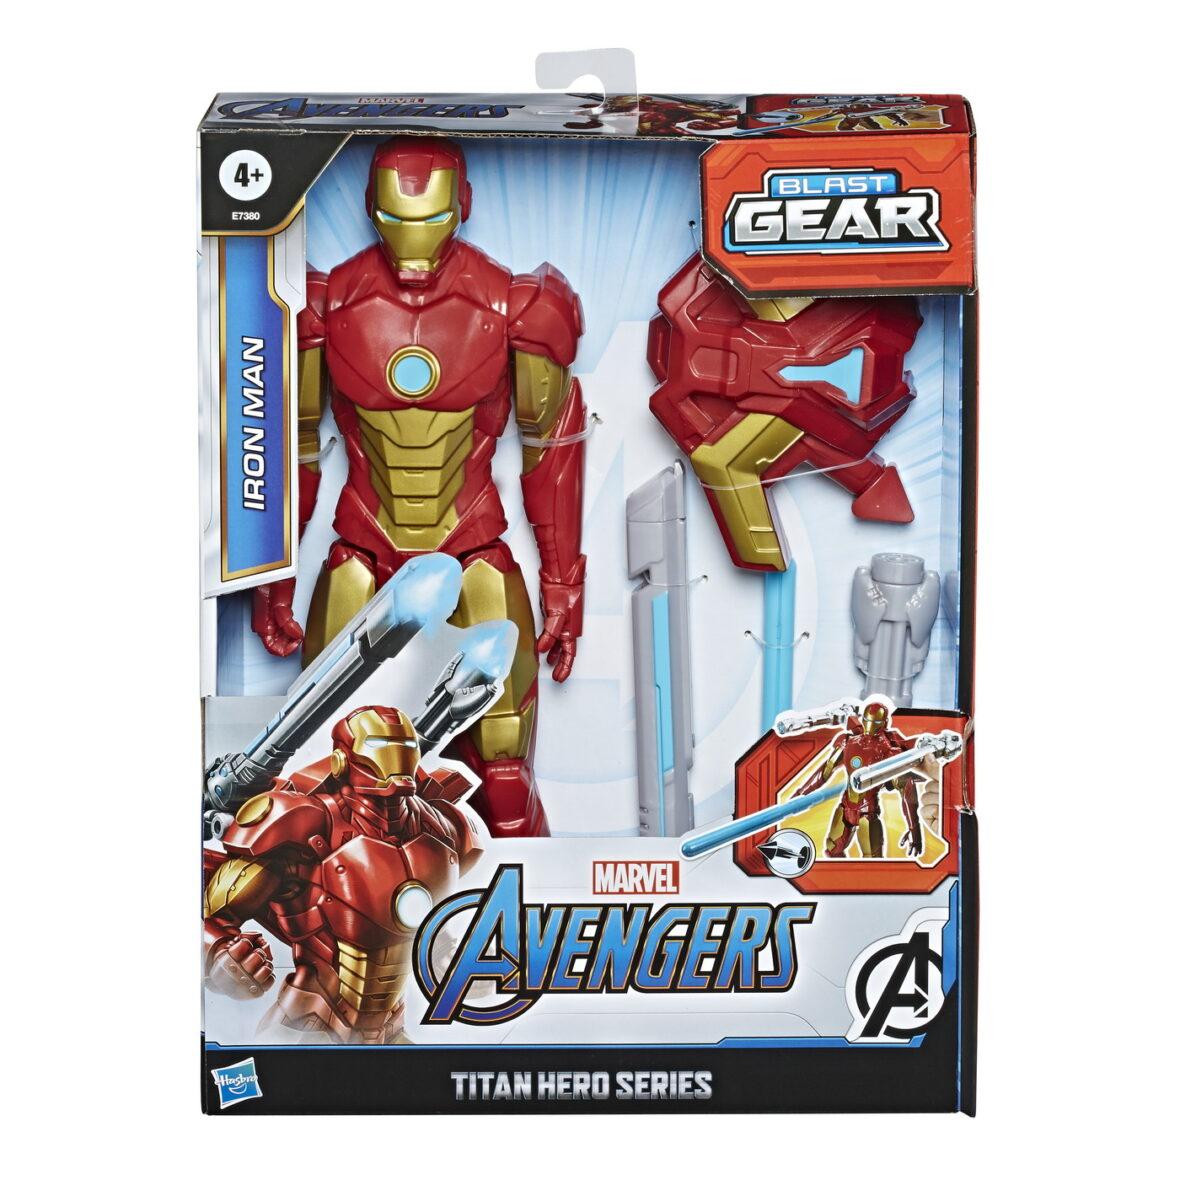 Avengers Figurina Titan Hero Blast Gear: Iron Man 30cm